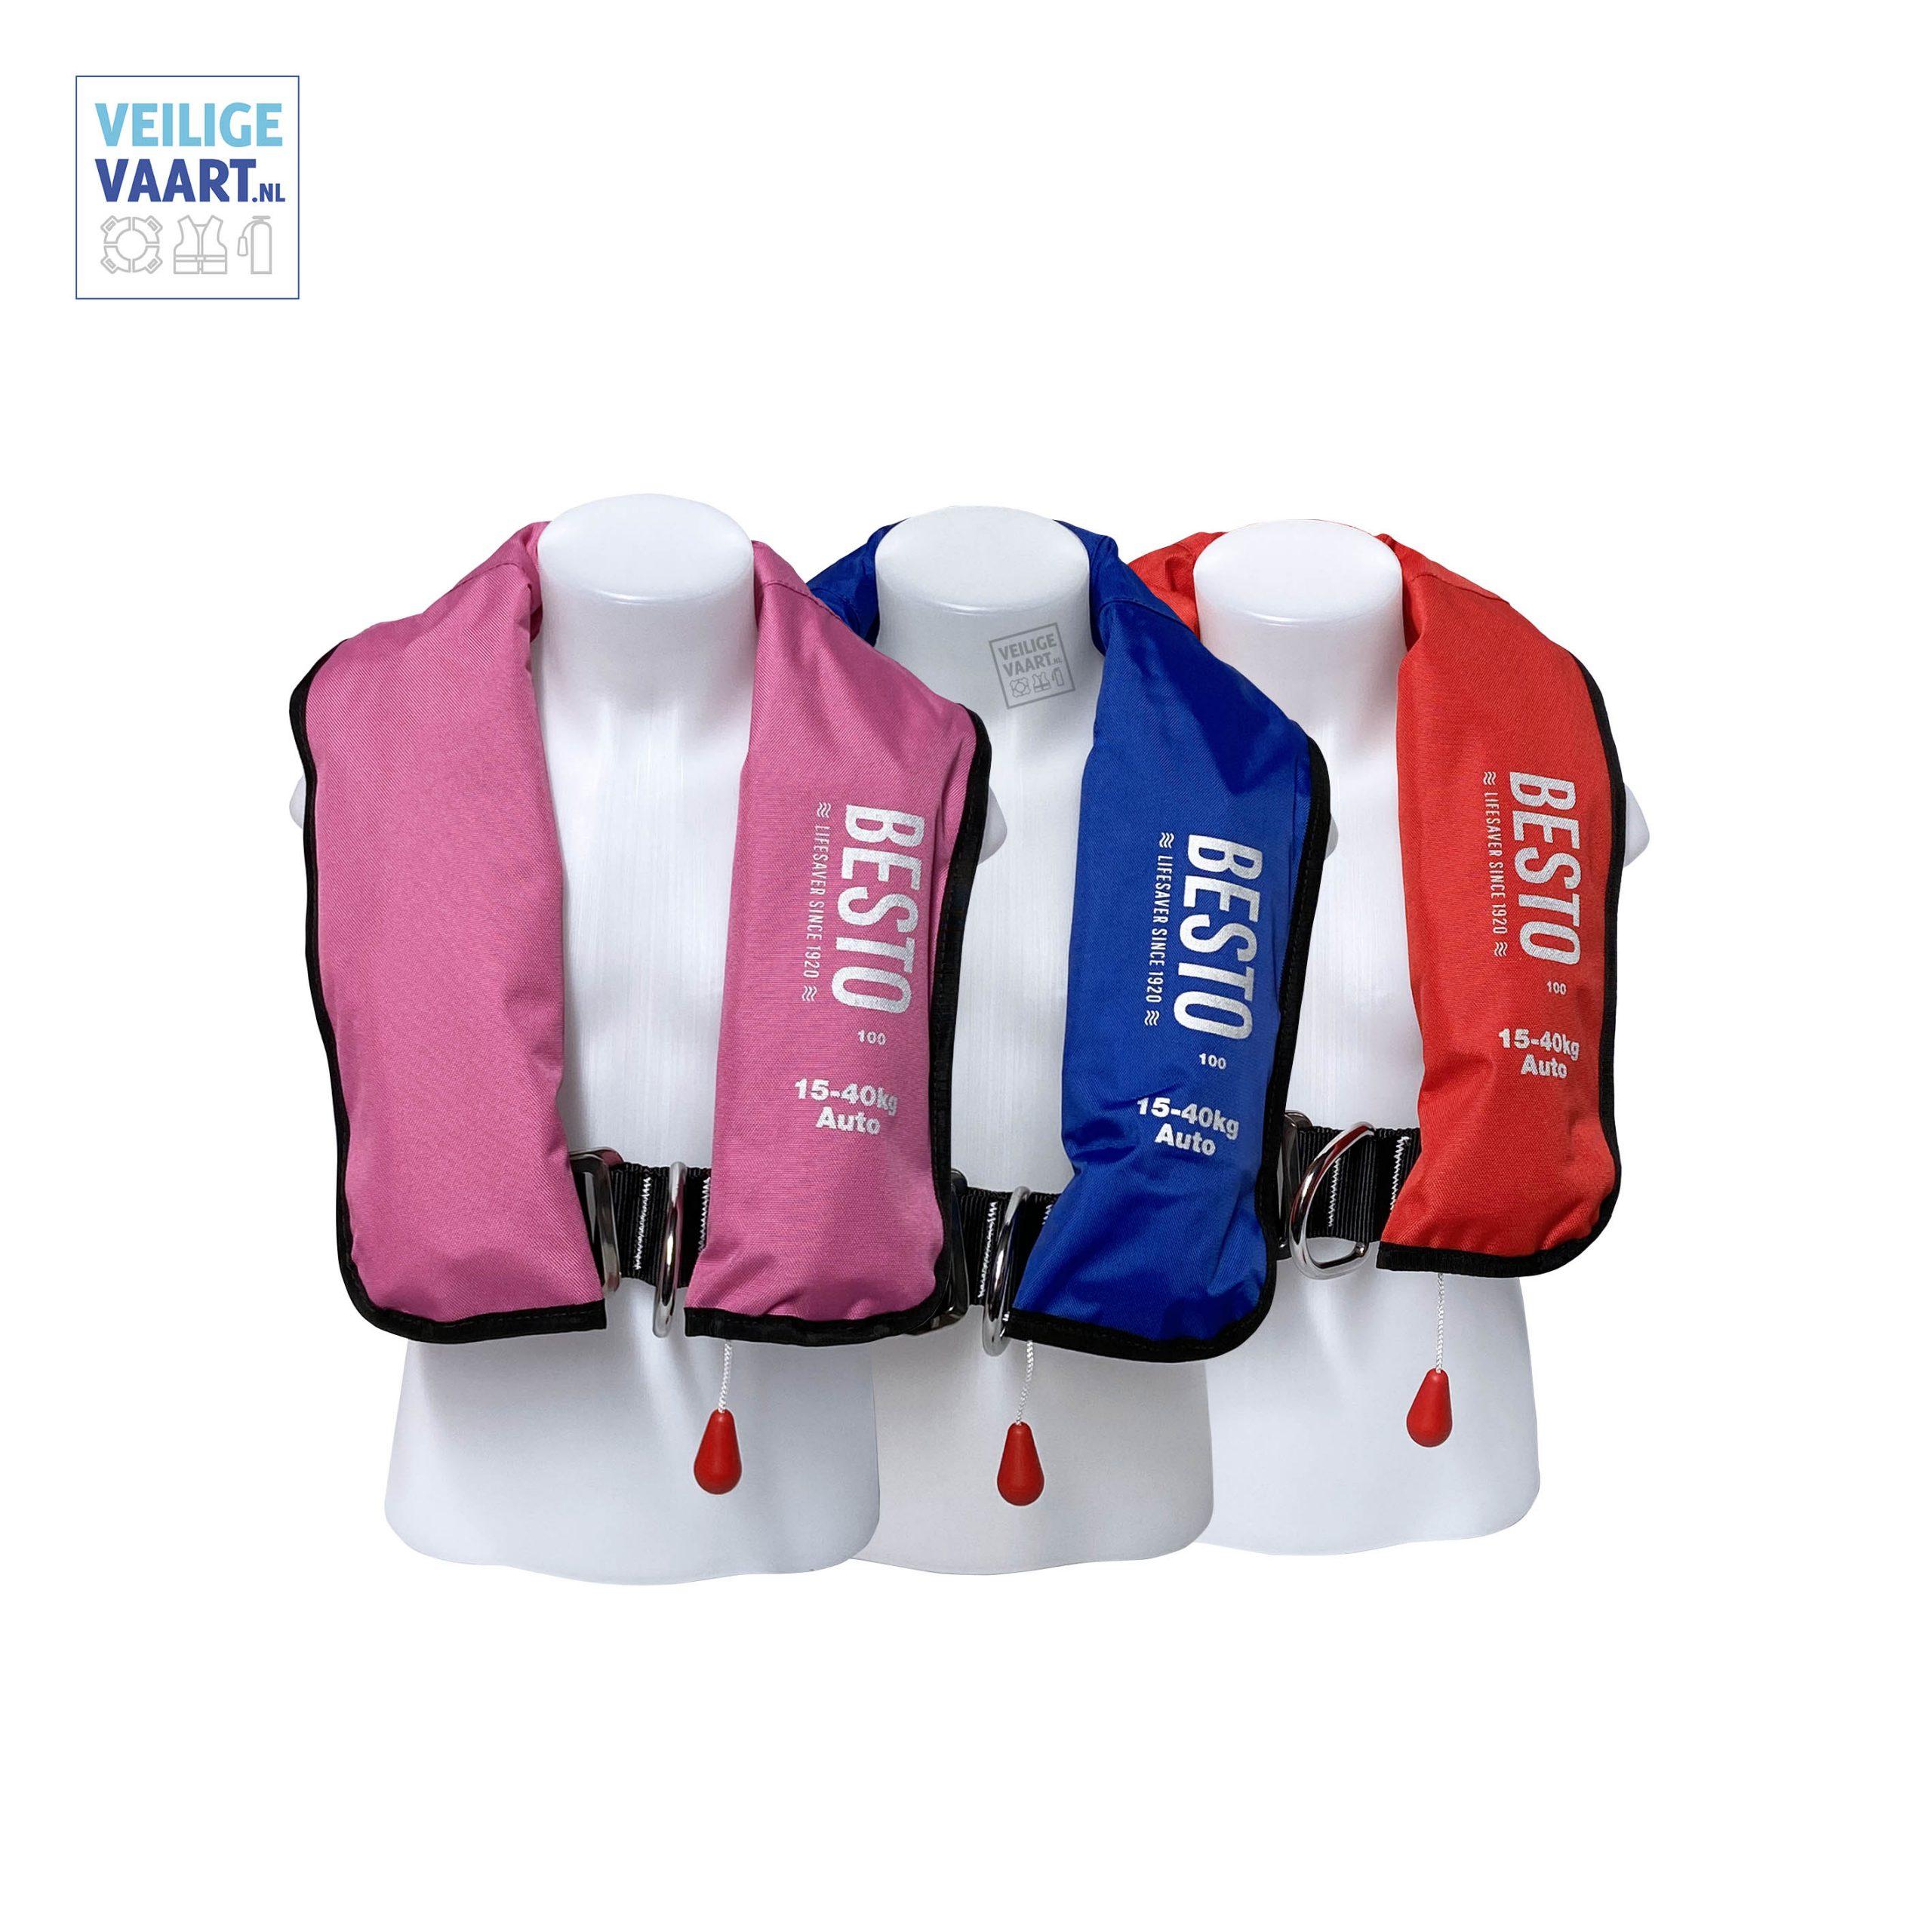 kinderen, reddingsvest, Automatisch noodvest voor kinderenautomatisch_kinderreddingsvest_besto_junior_inflatable_100n